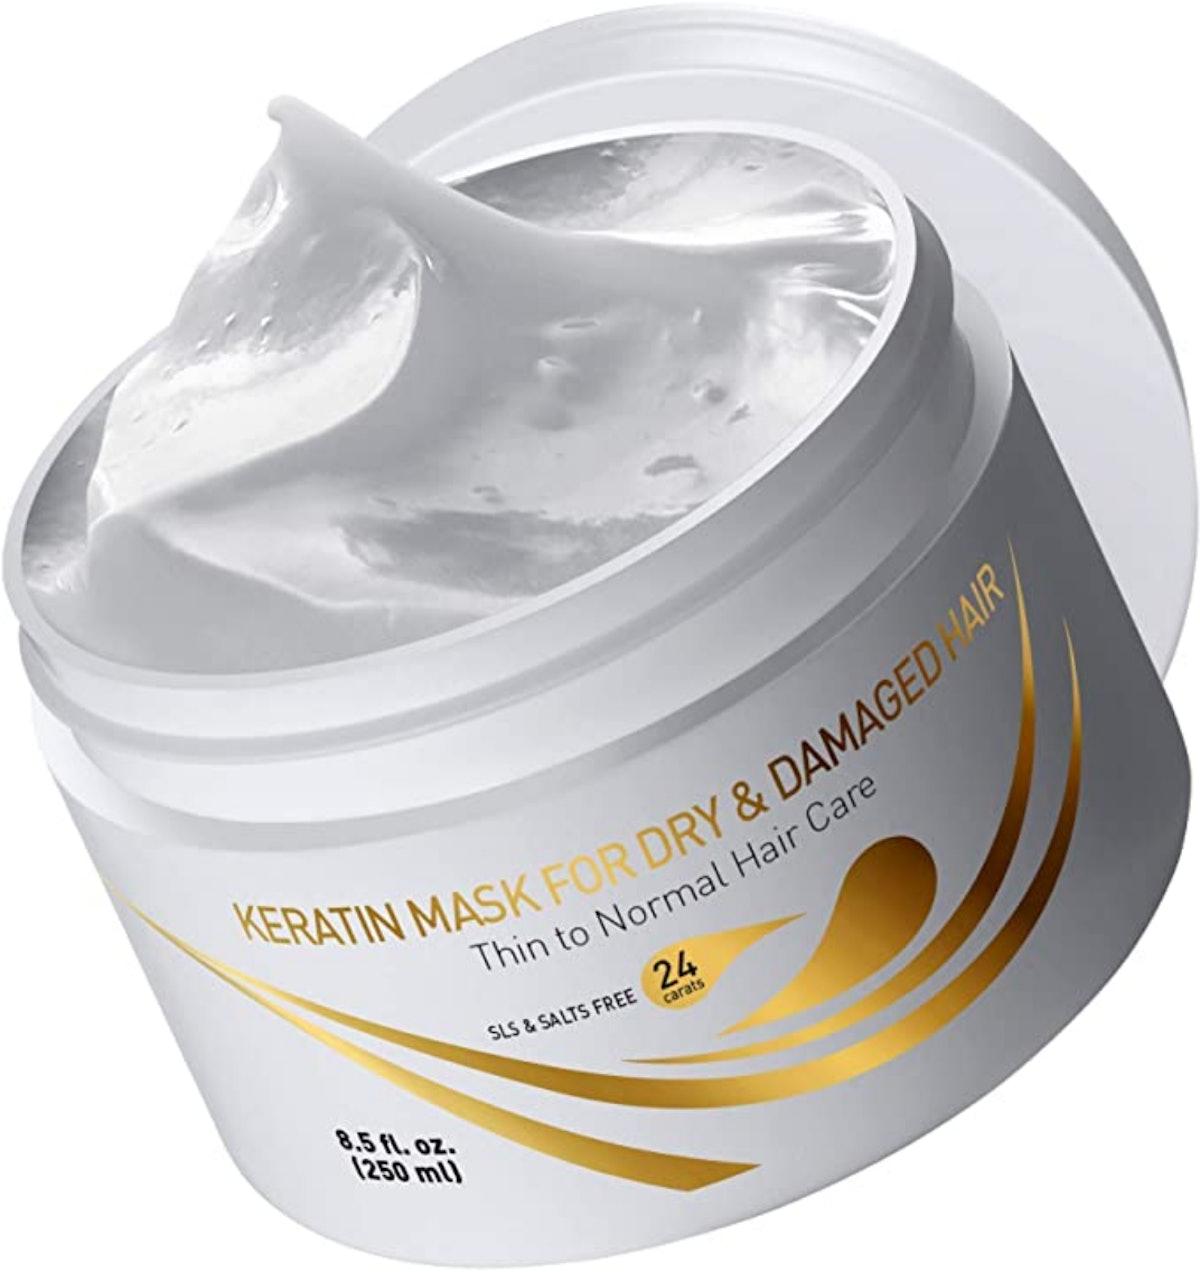 Vitamins Hair Cosmetic Keratin Mask For Dry & Damaged Hair